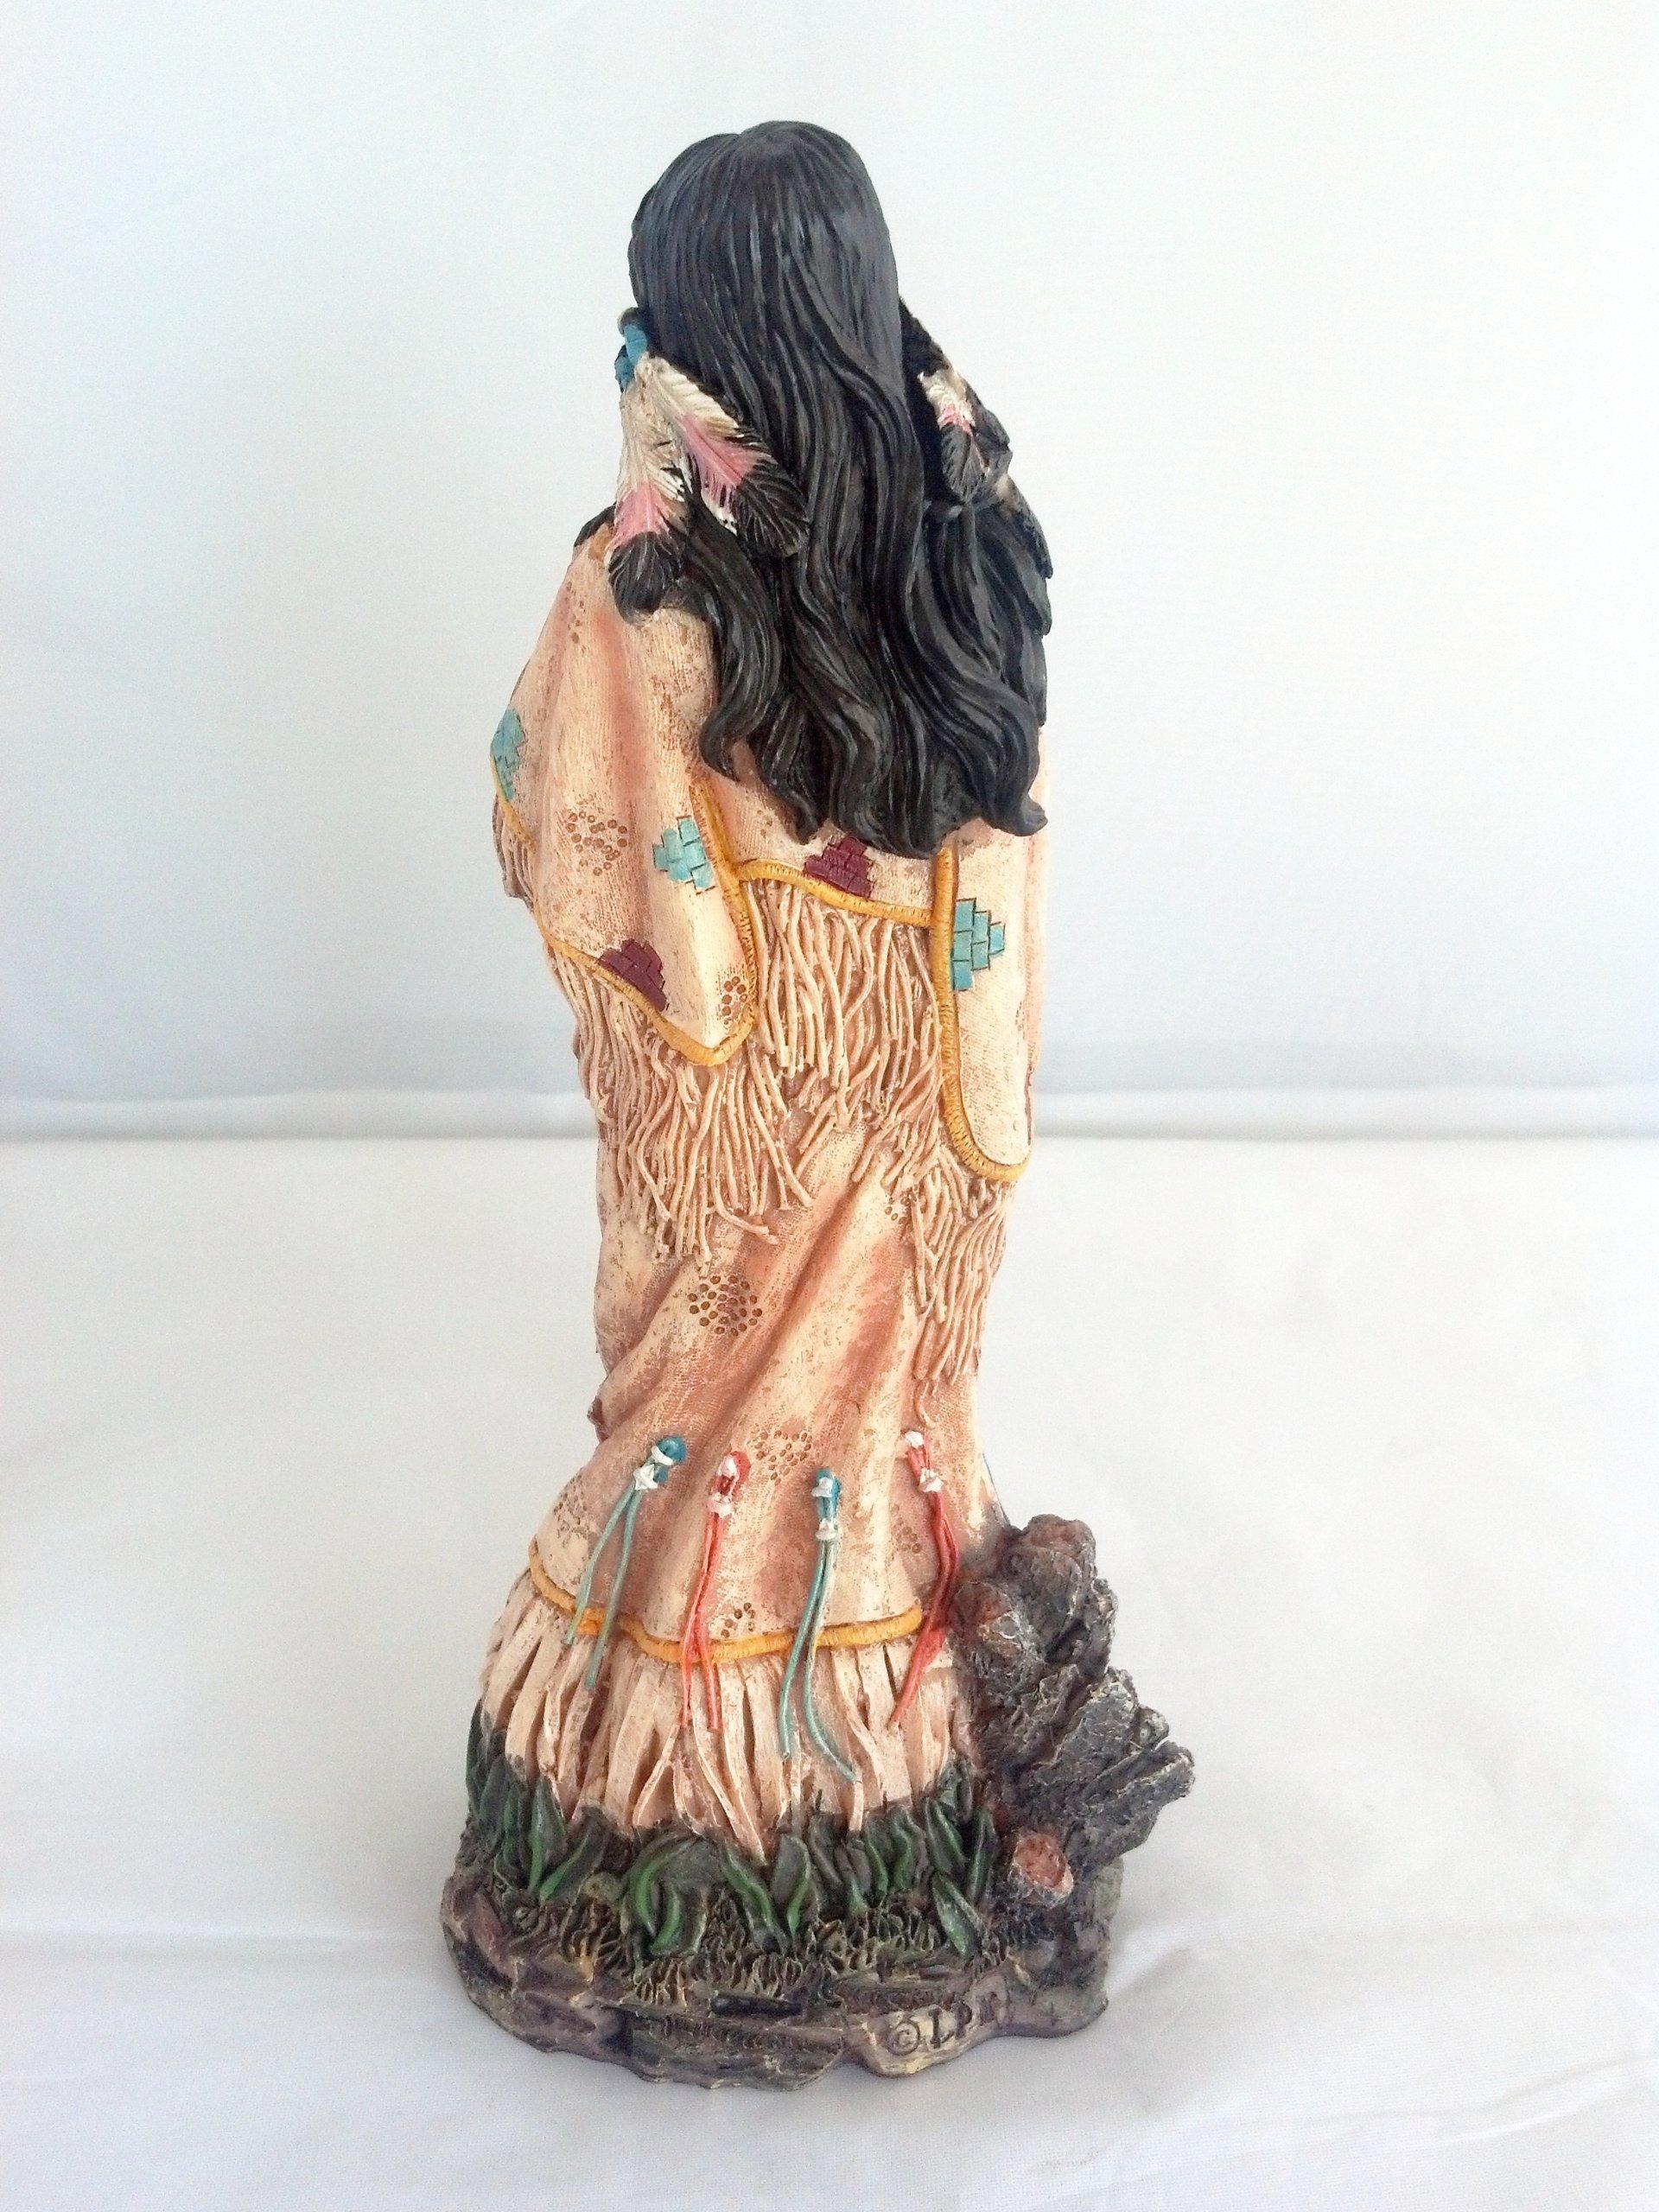 11 Inch Indian Girl w/ Baby Statue Figure Figurine Warrior Indio India American